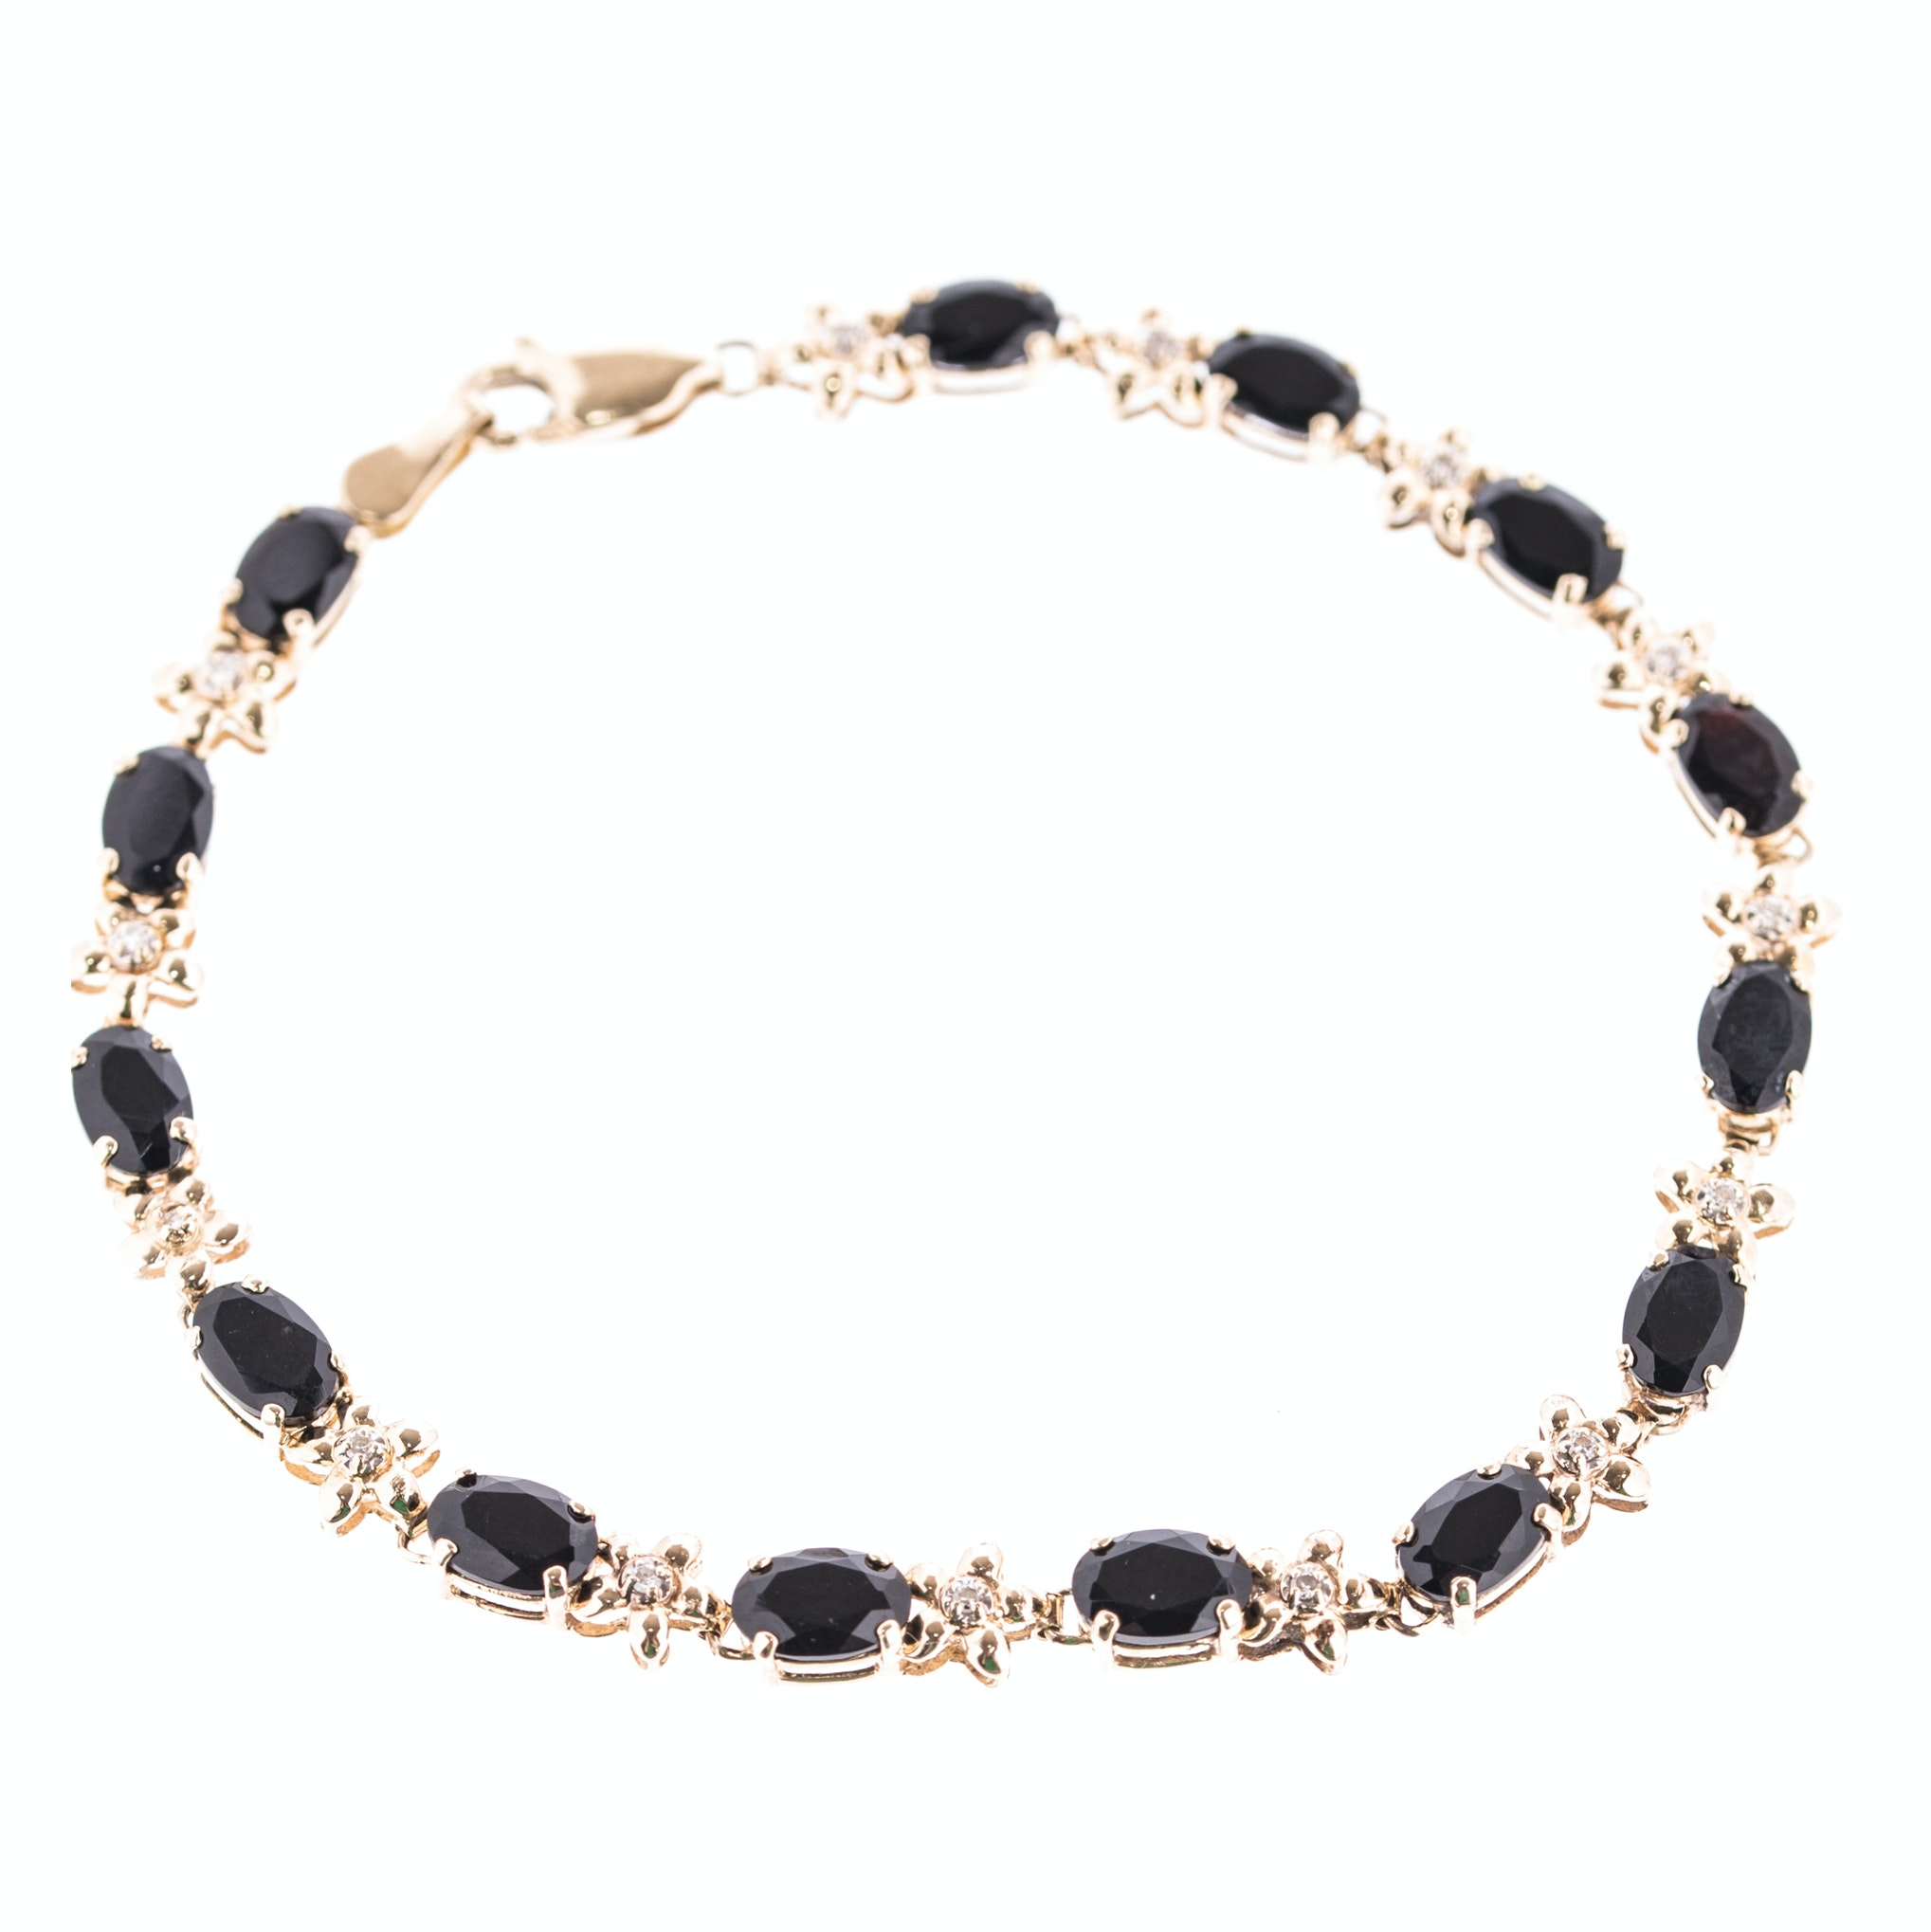 14K Yellow Gold Black Onyx and Diamond Bracelet